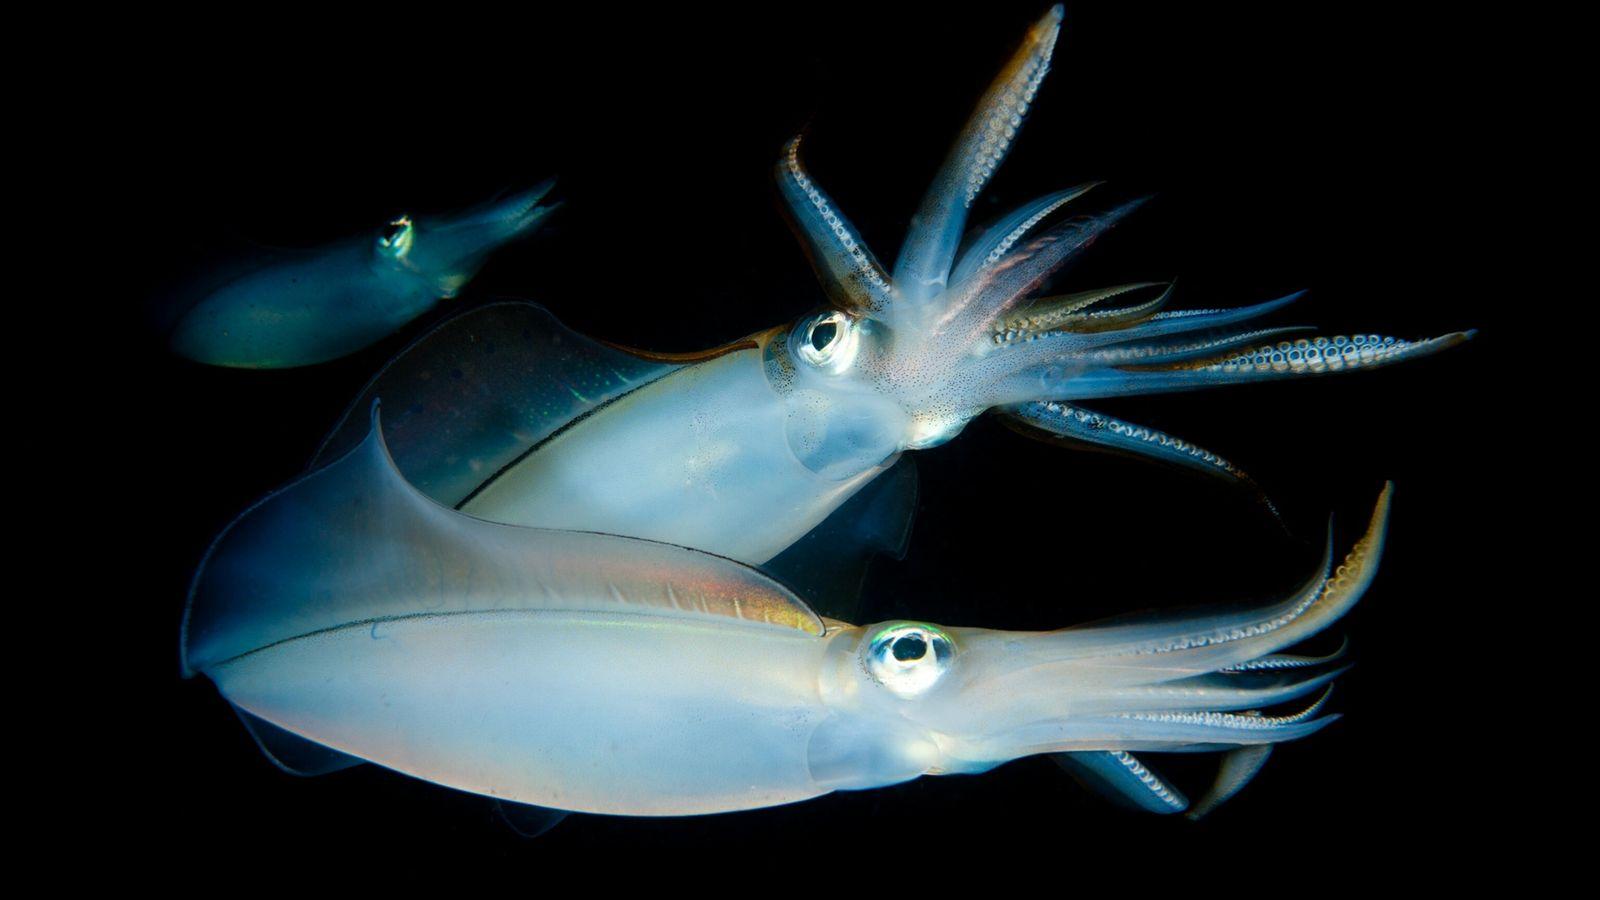 Calamares ovalados